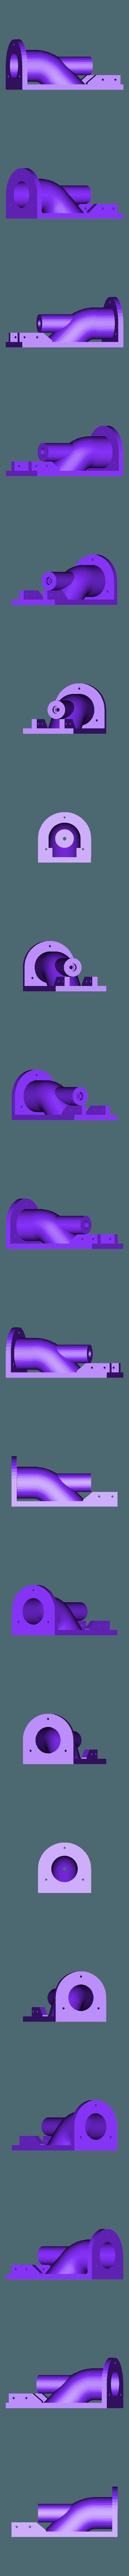 4mm_Shaft_Jethousing.stl Download free STL file Water Jet for 540 Motors • 3D printable object, SeanTheITGuy